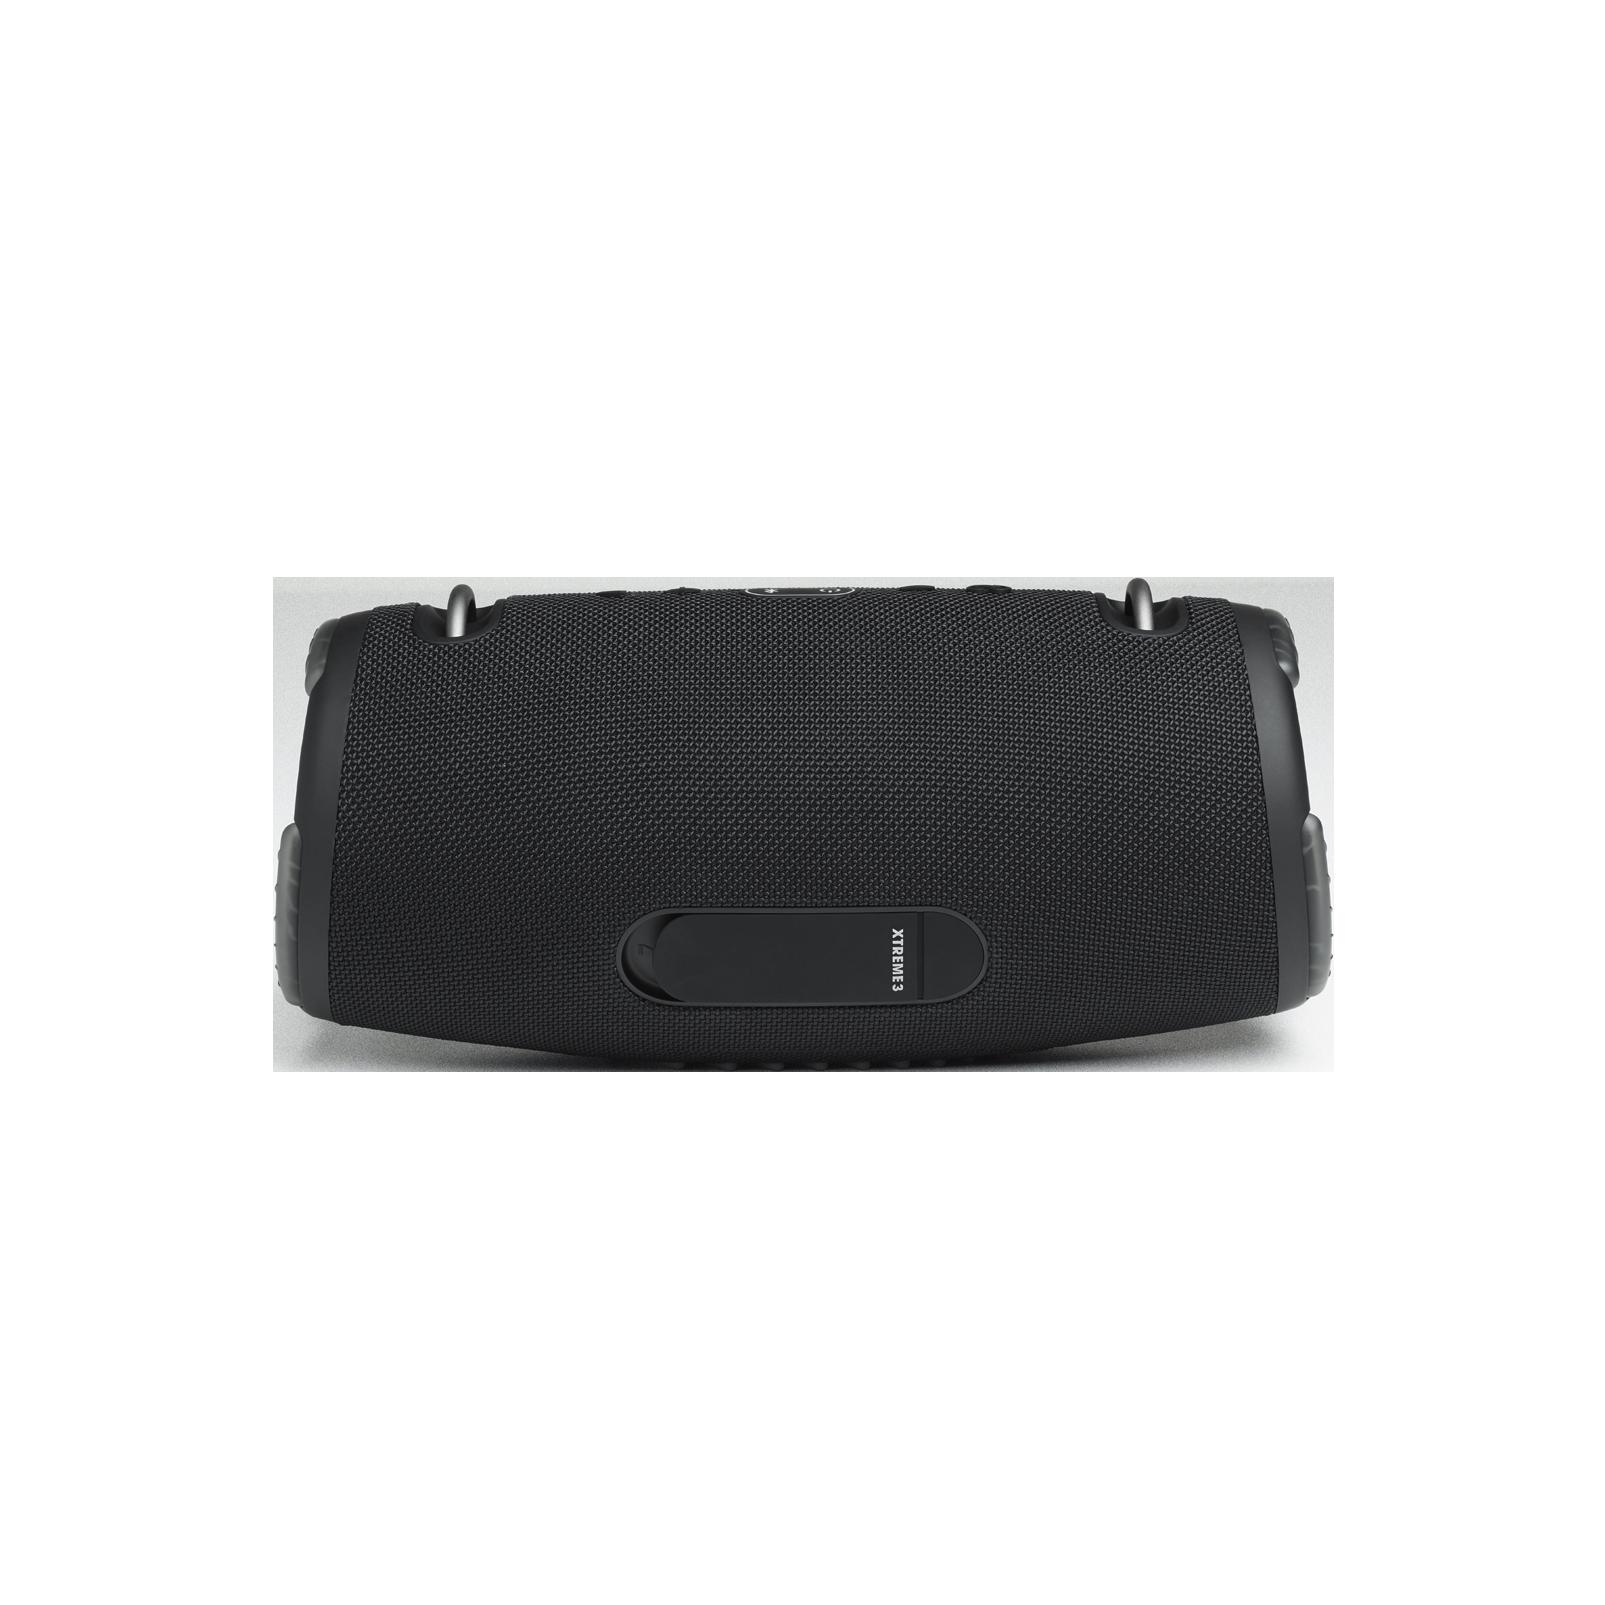 JBL Xtreme 3 - Black - Portable waterproof speaker - Back